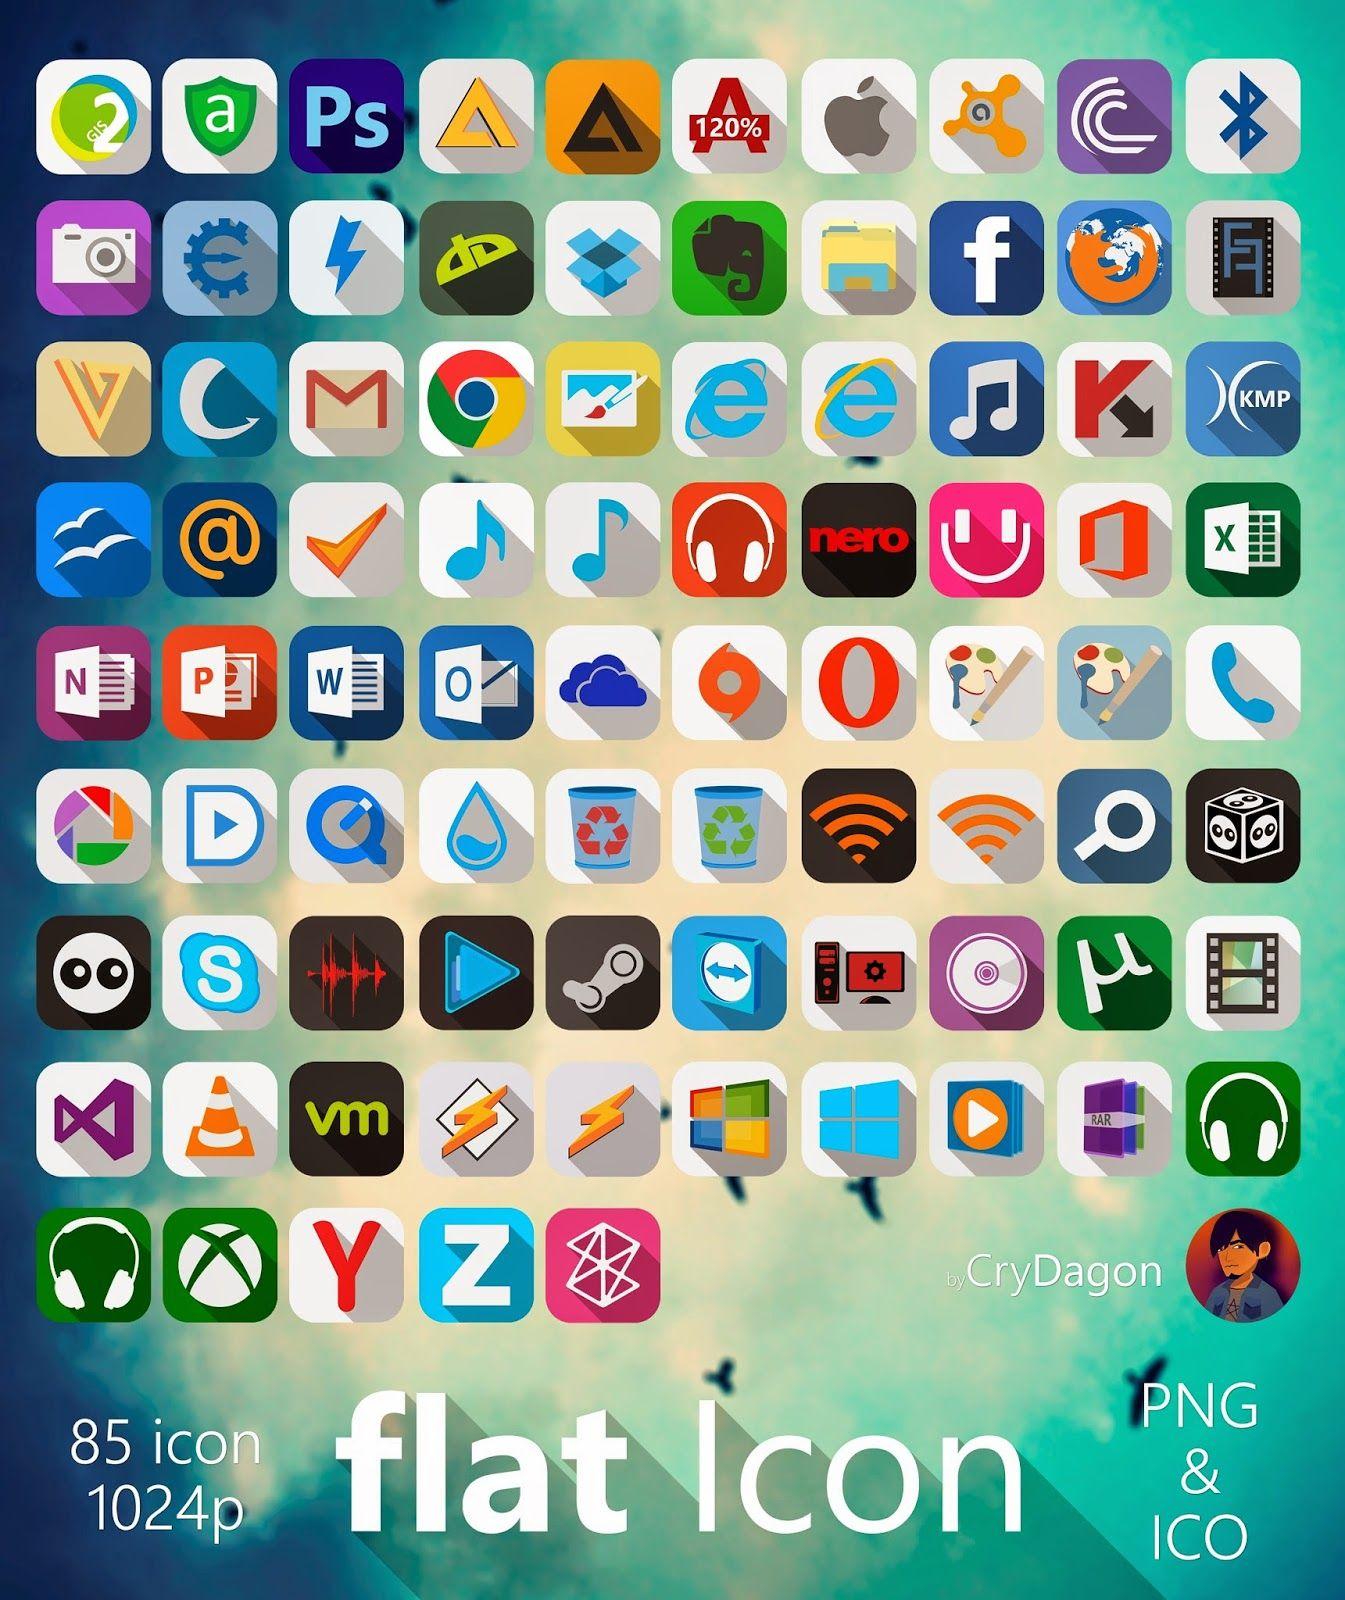 Shirae Black Icon Pack Full HD cleodesktop Download http